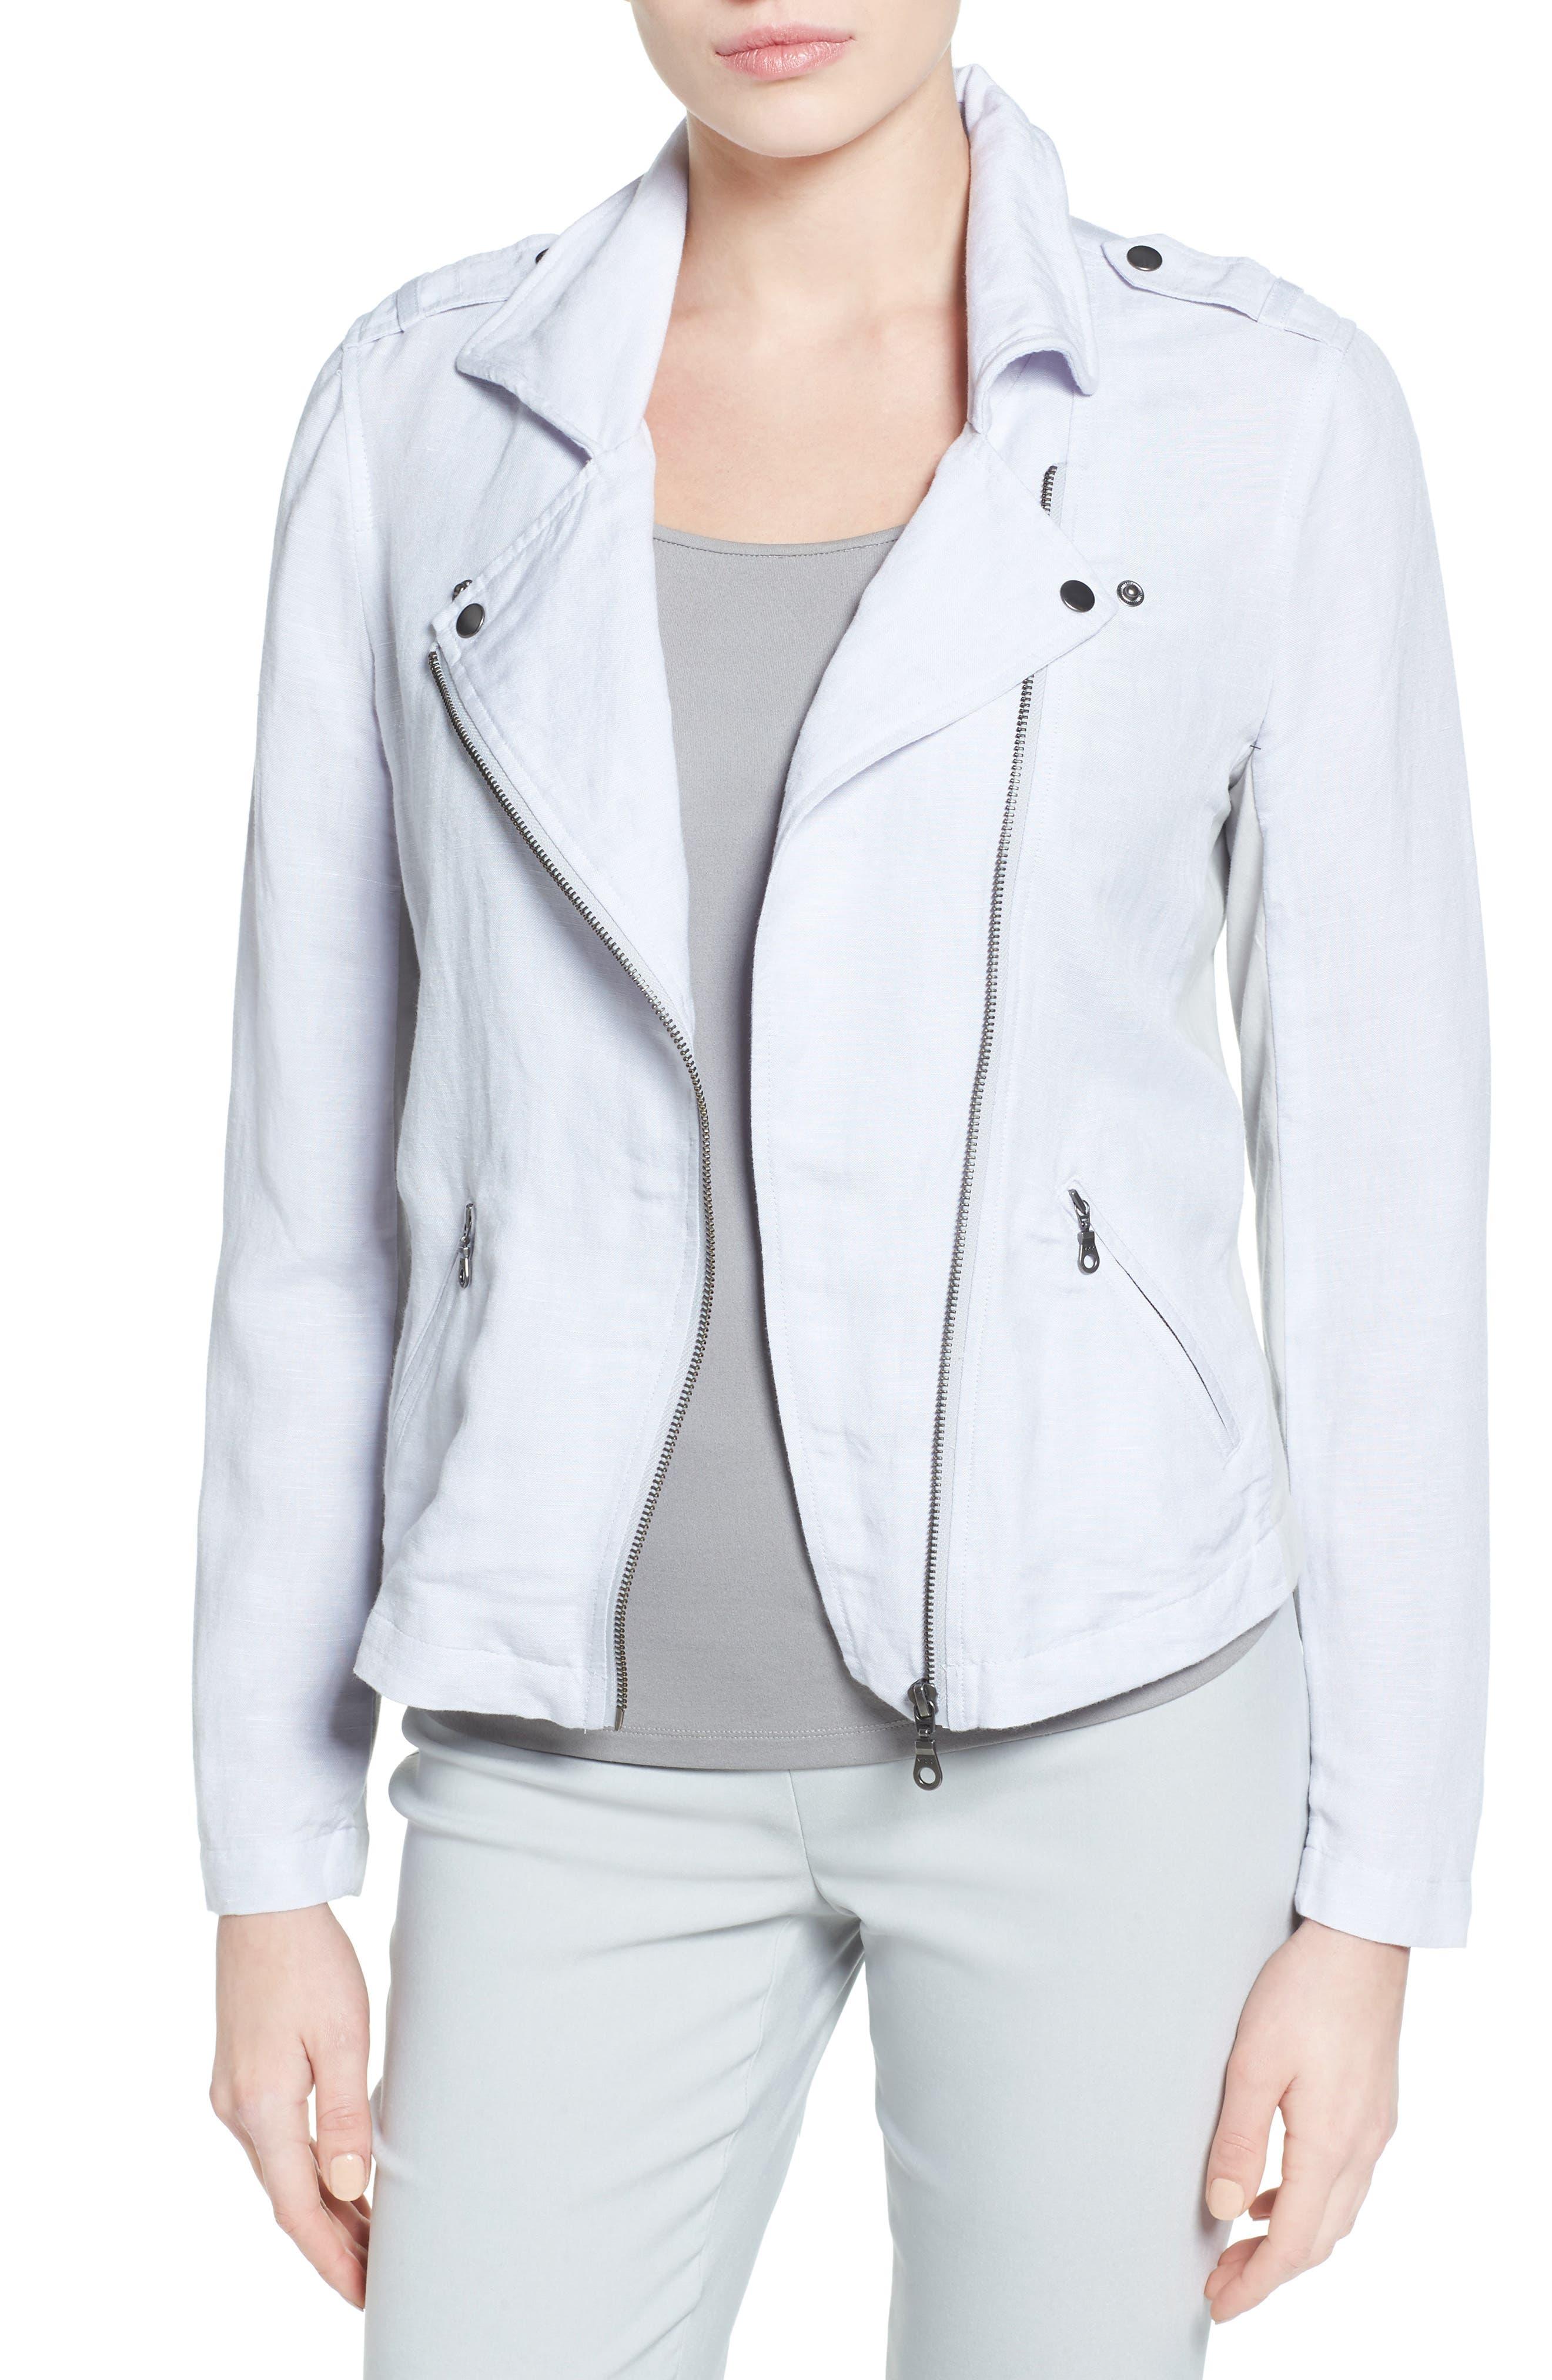 Alternate Image 1 Selected - NIC+ZOE Linen Blend Biker Jacket (Regular & Petite)